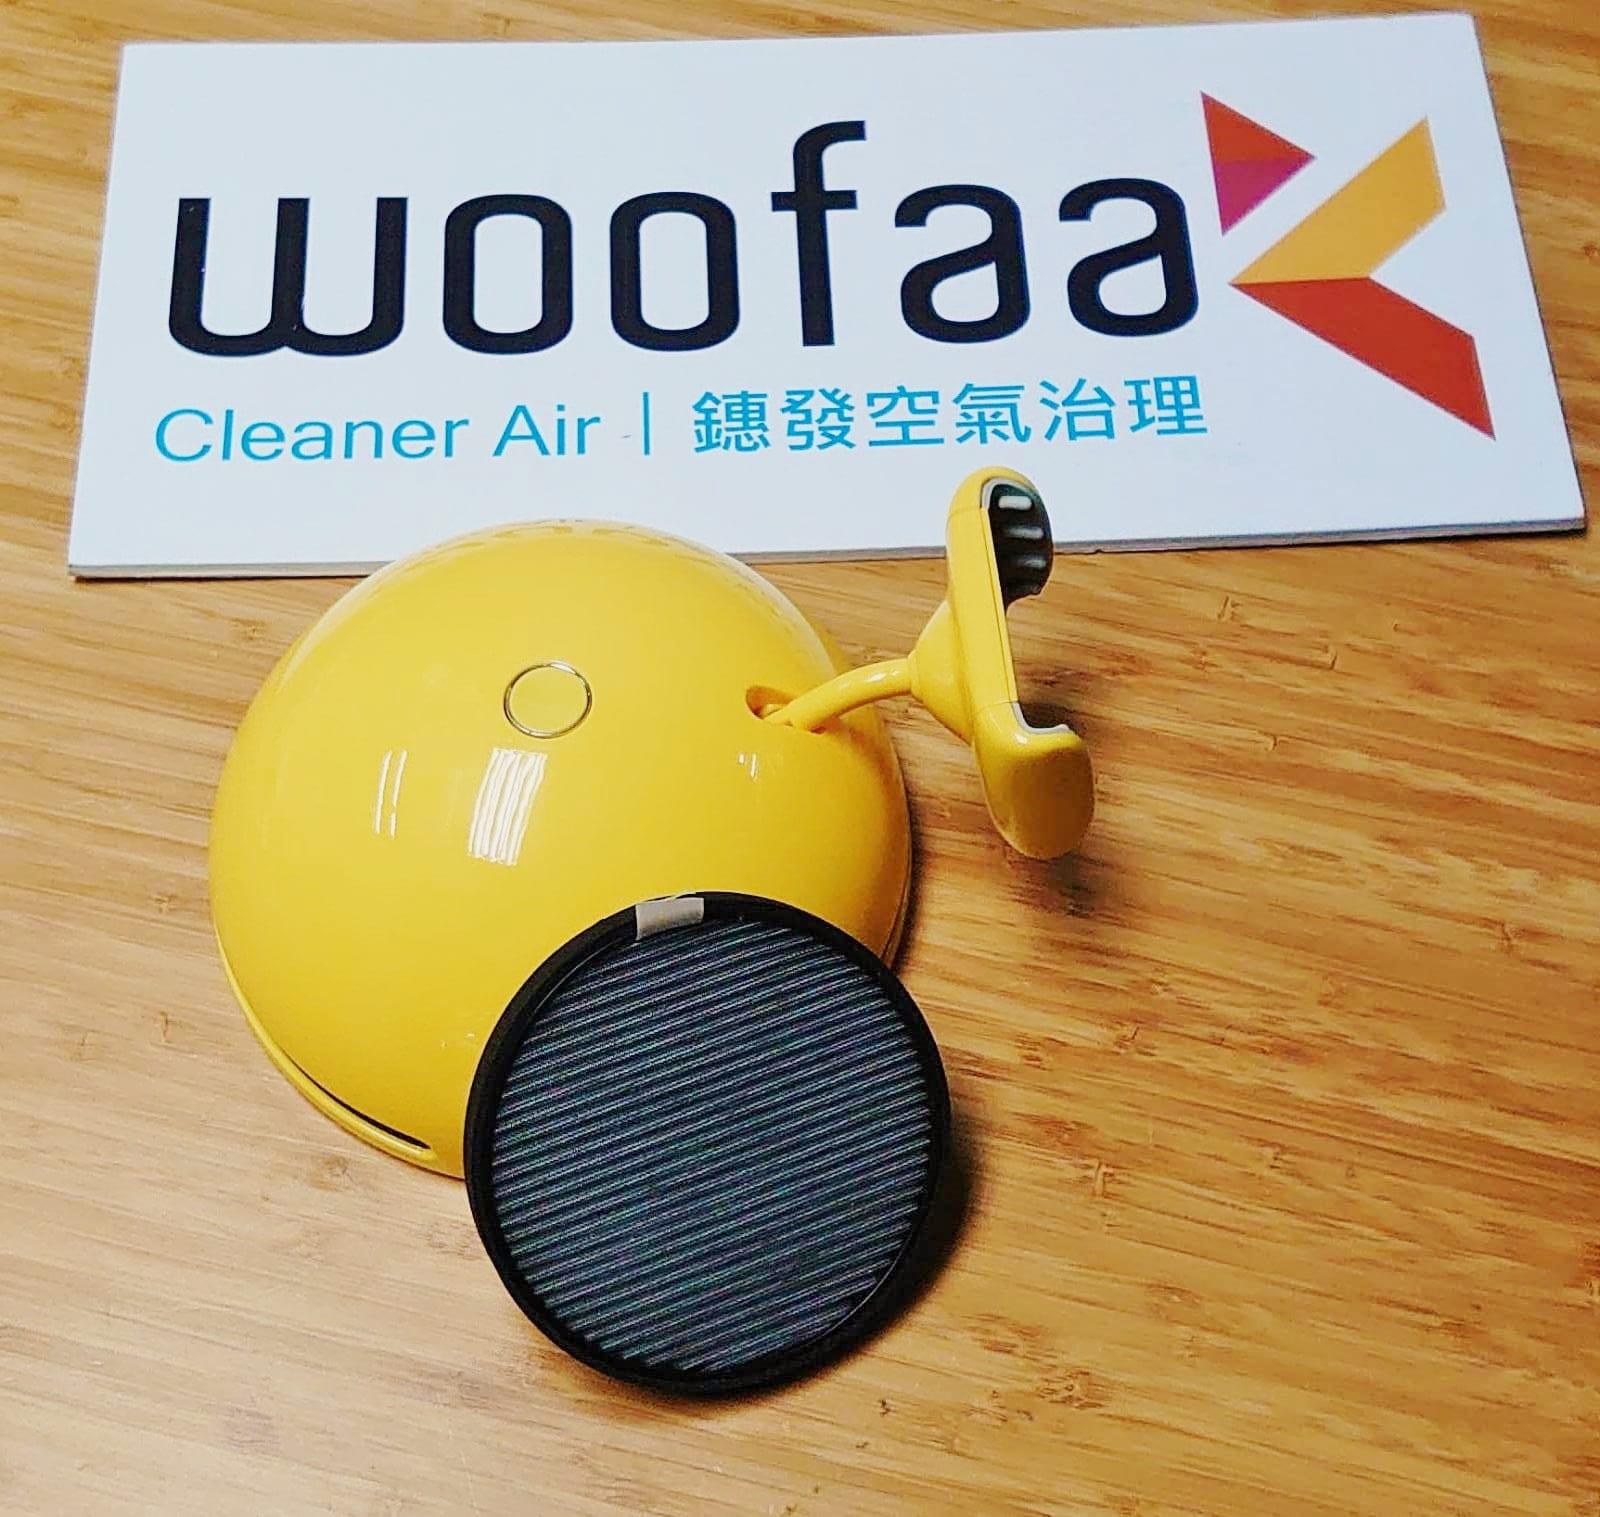 Replacement Filter for Unicorn Desktop Air Purifier HCC3909F